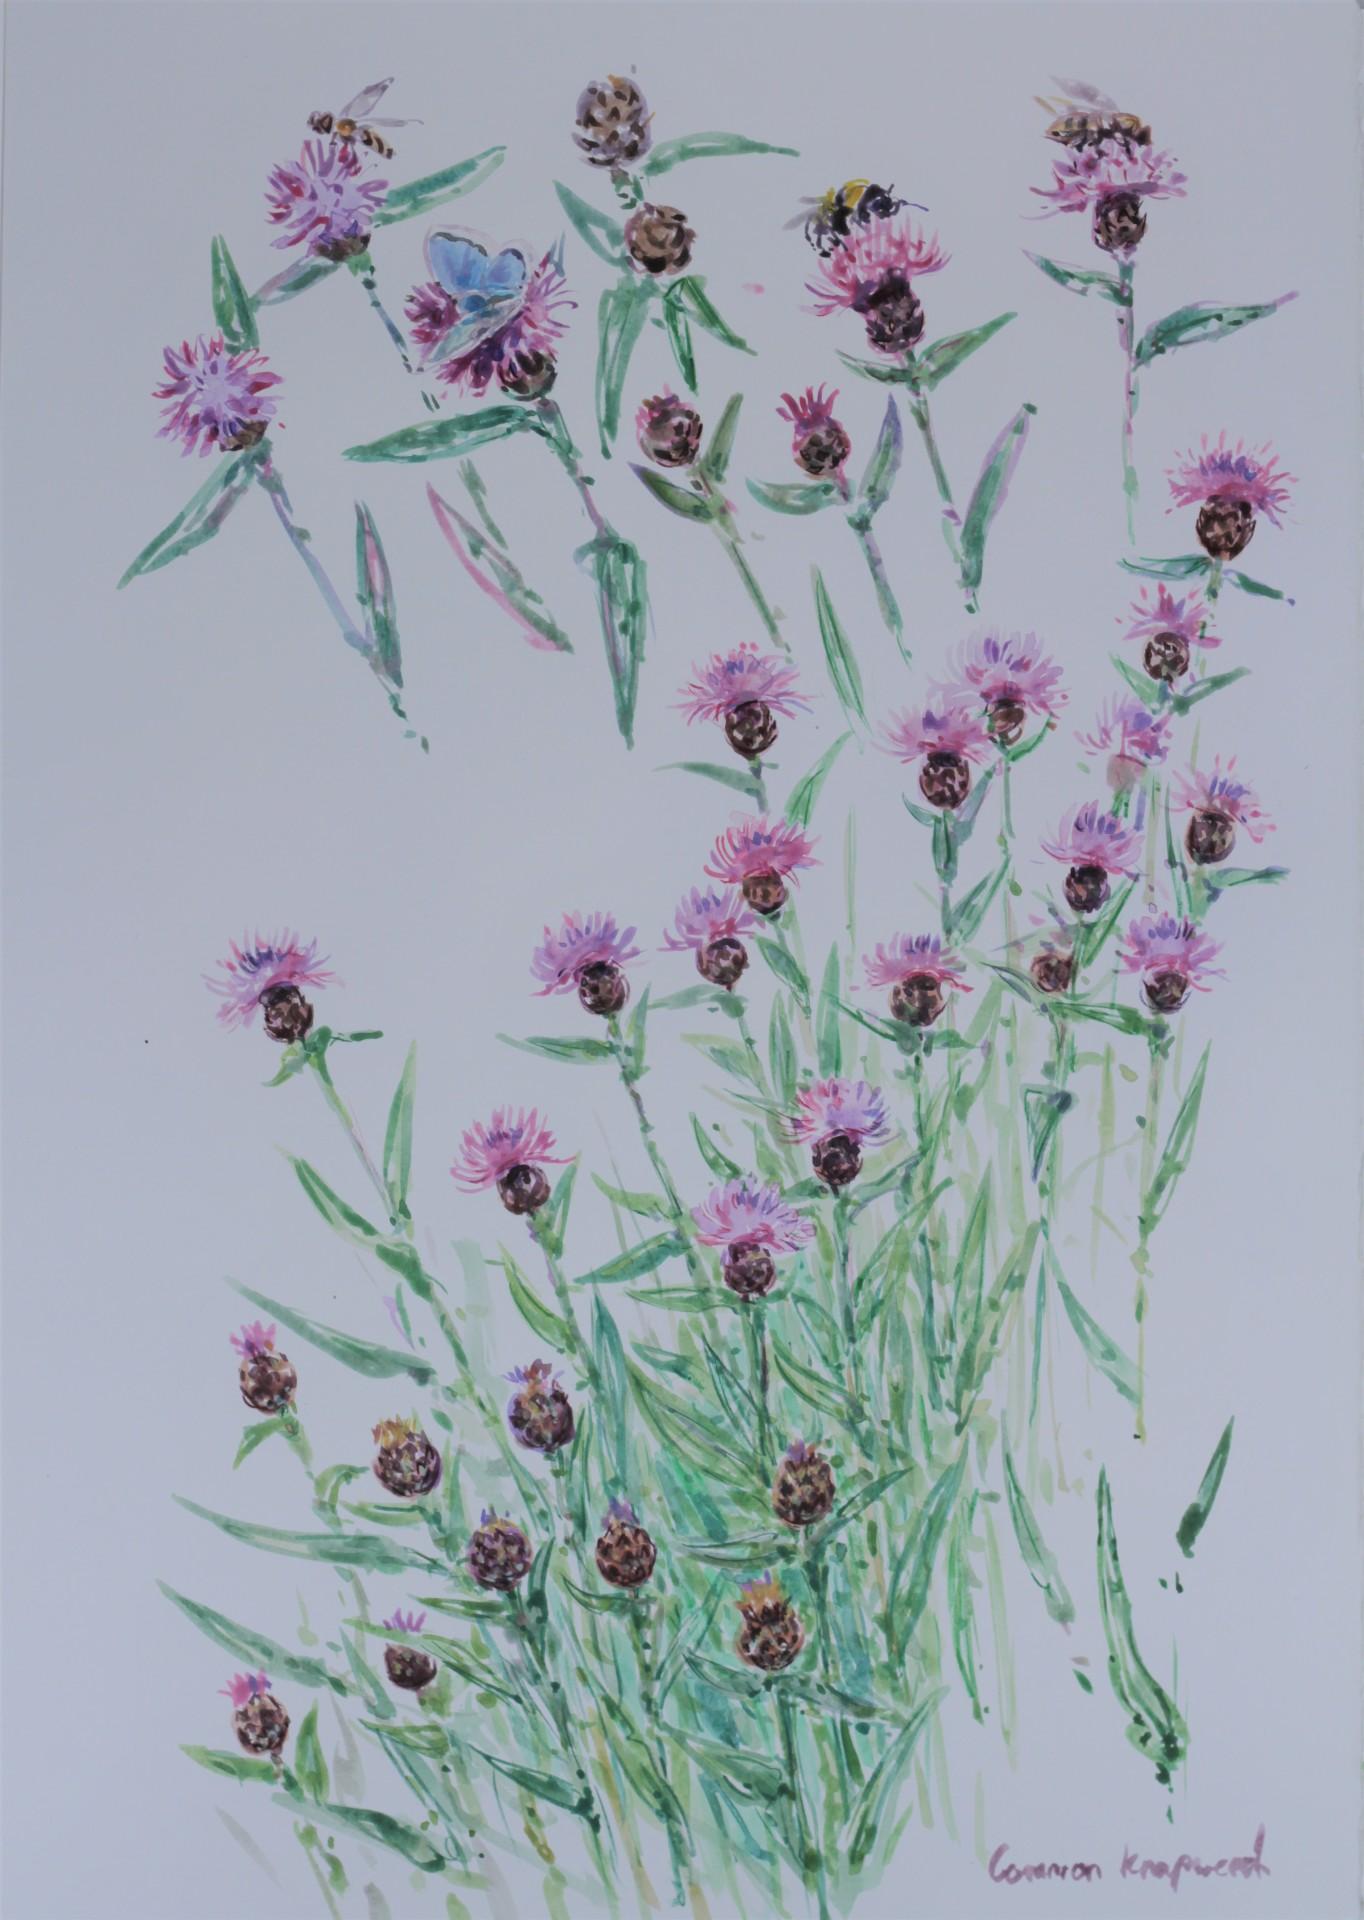 Bumble Bee on Knapweed Studies